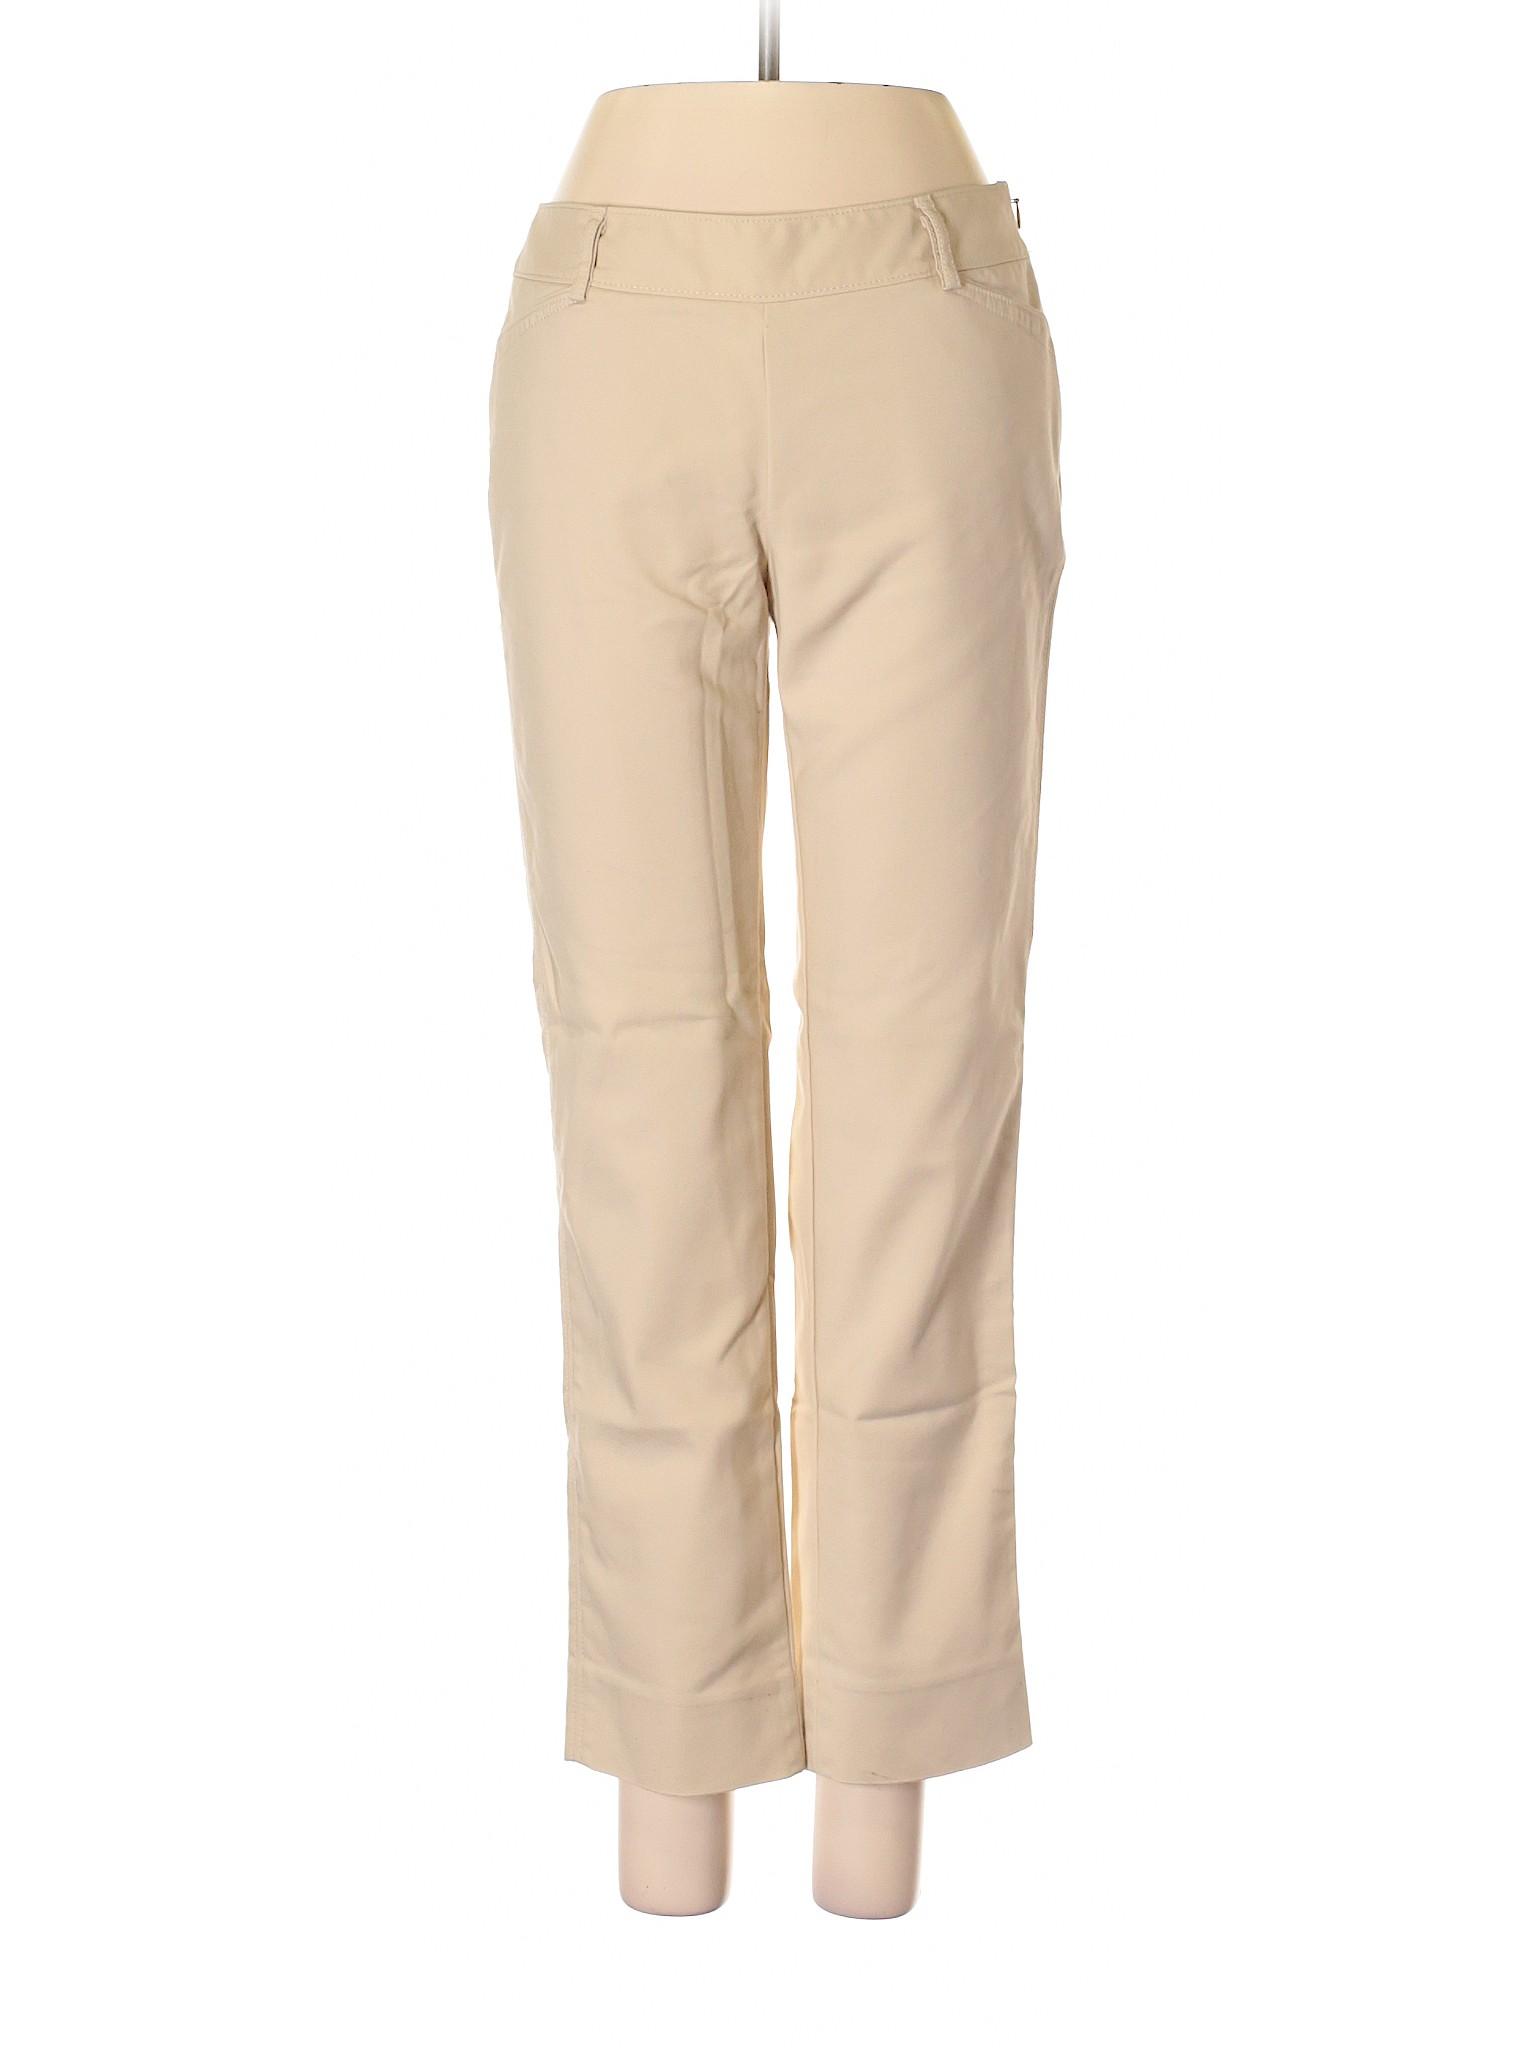 Dress Black House White Leisure Pants Market winter 1nP6XwxH